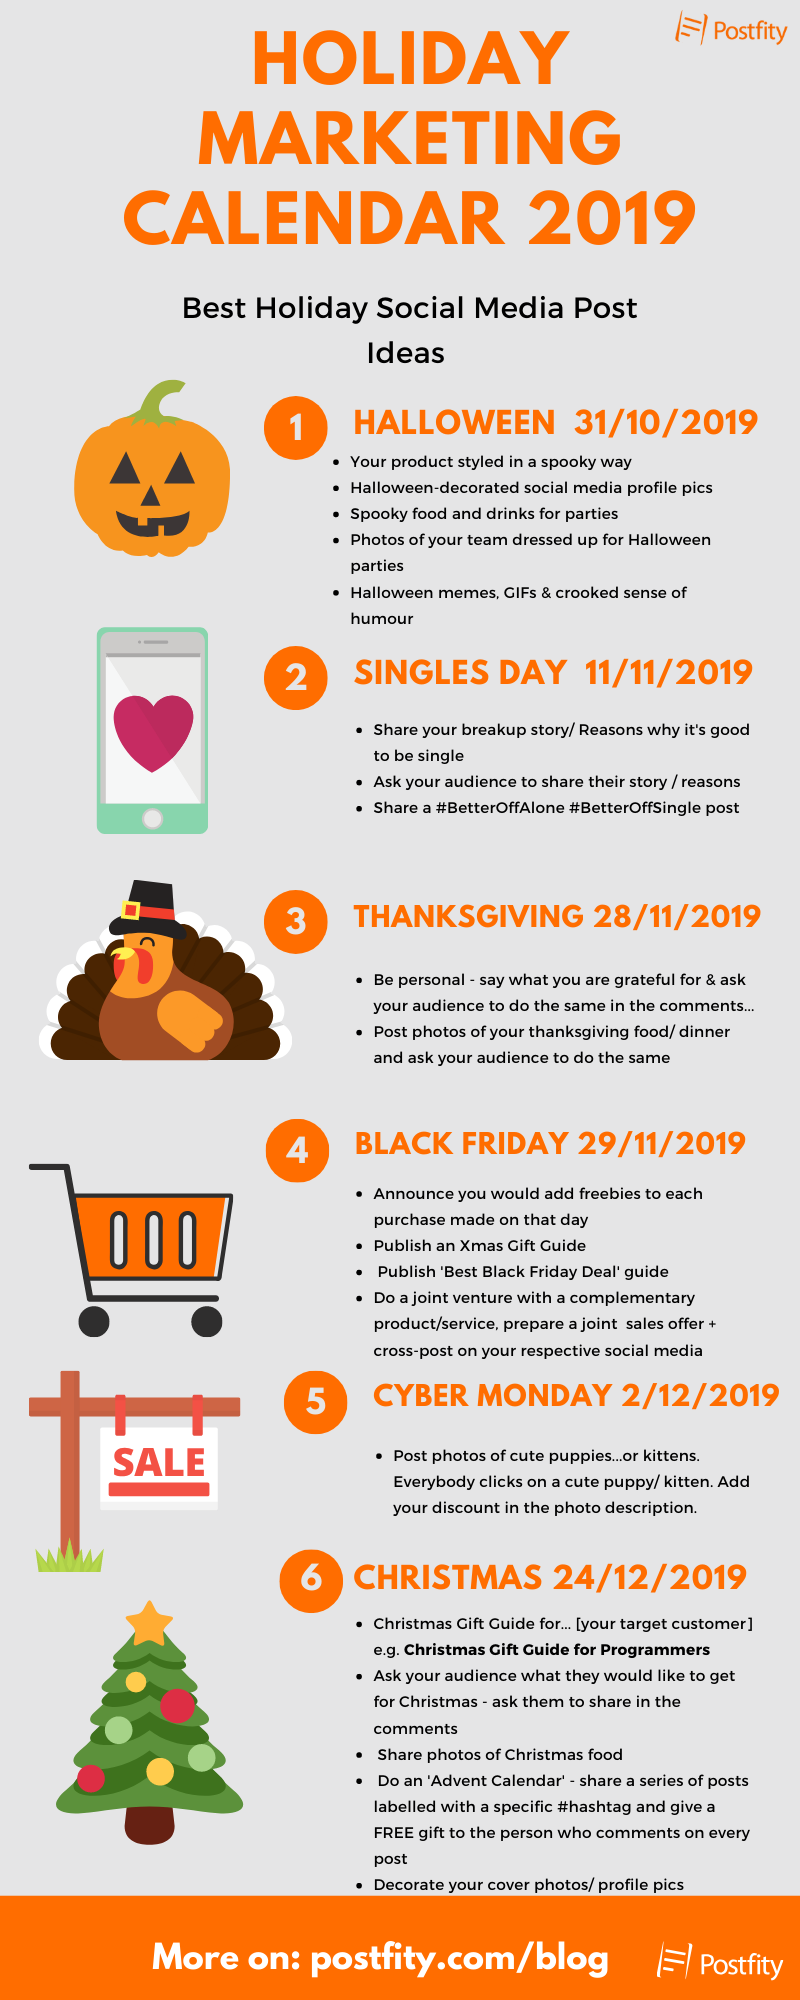 Holiday Marketing Calendar 2019